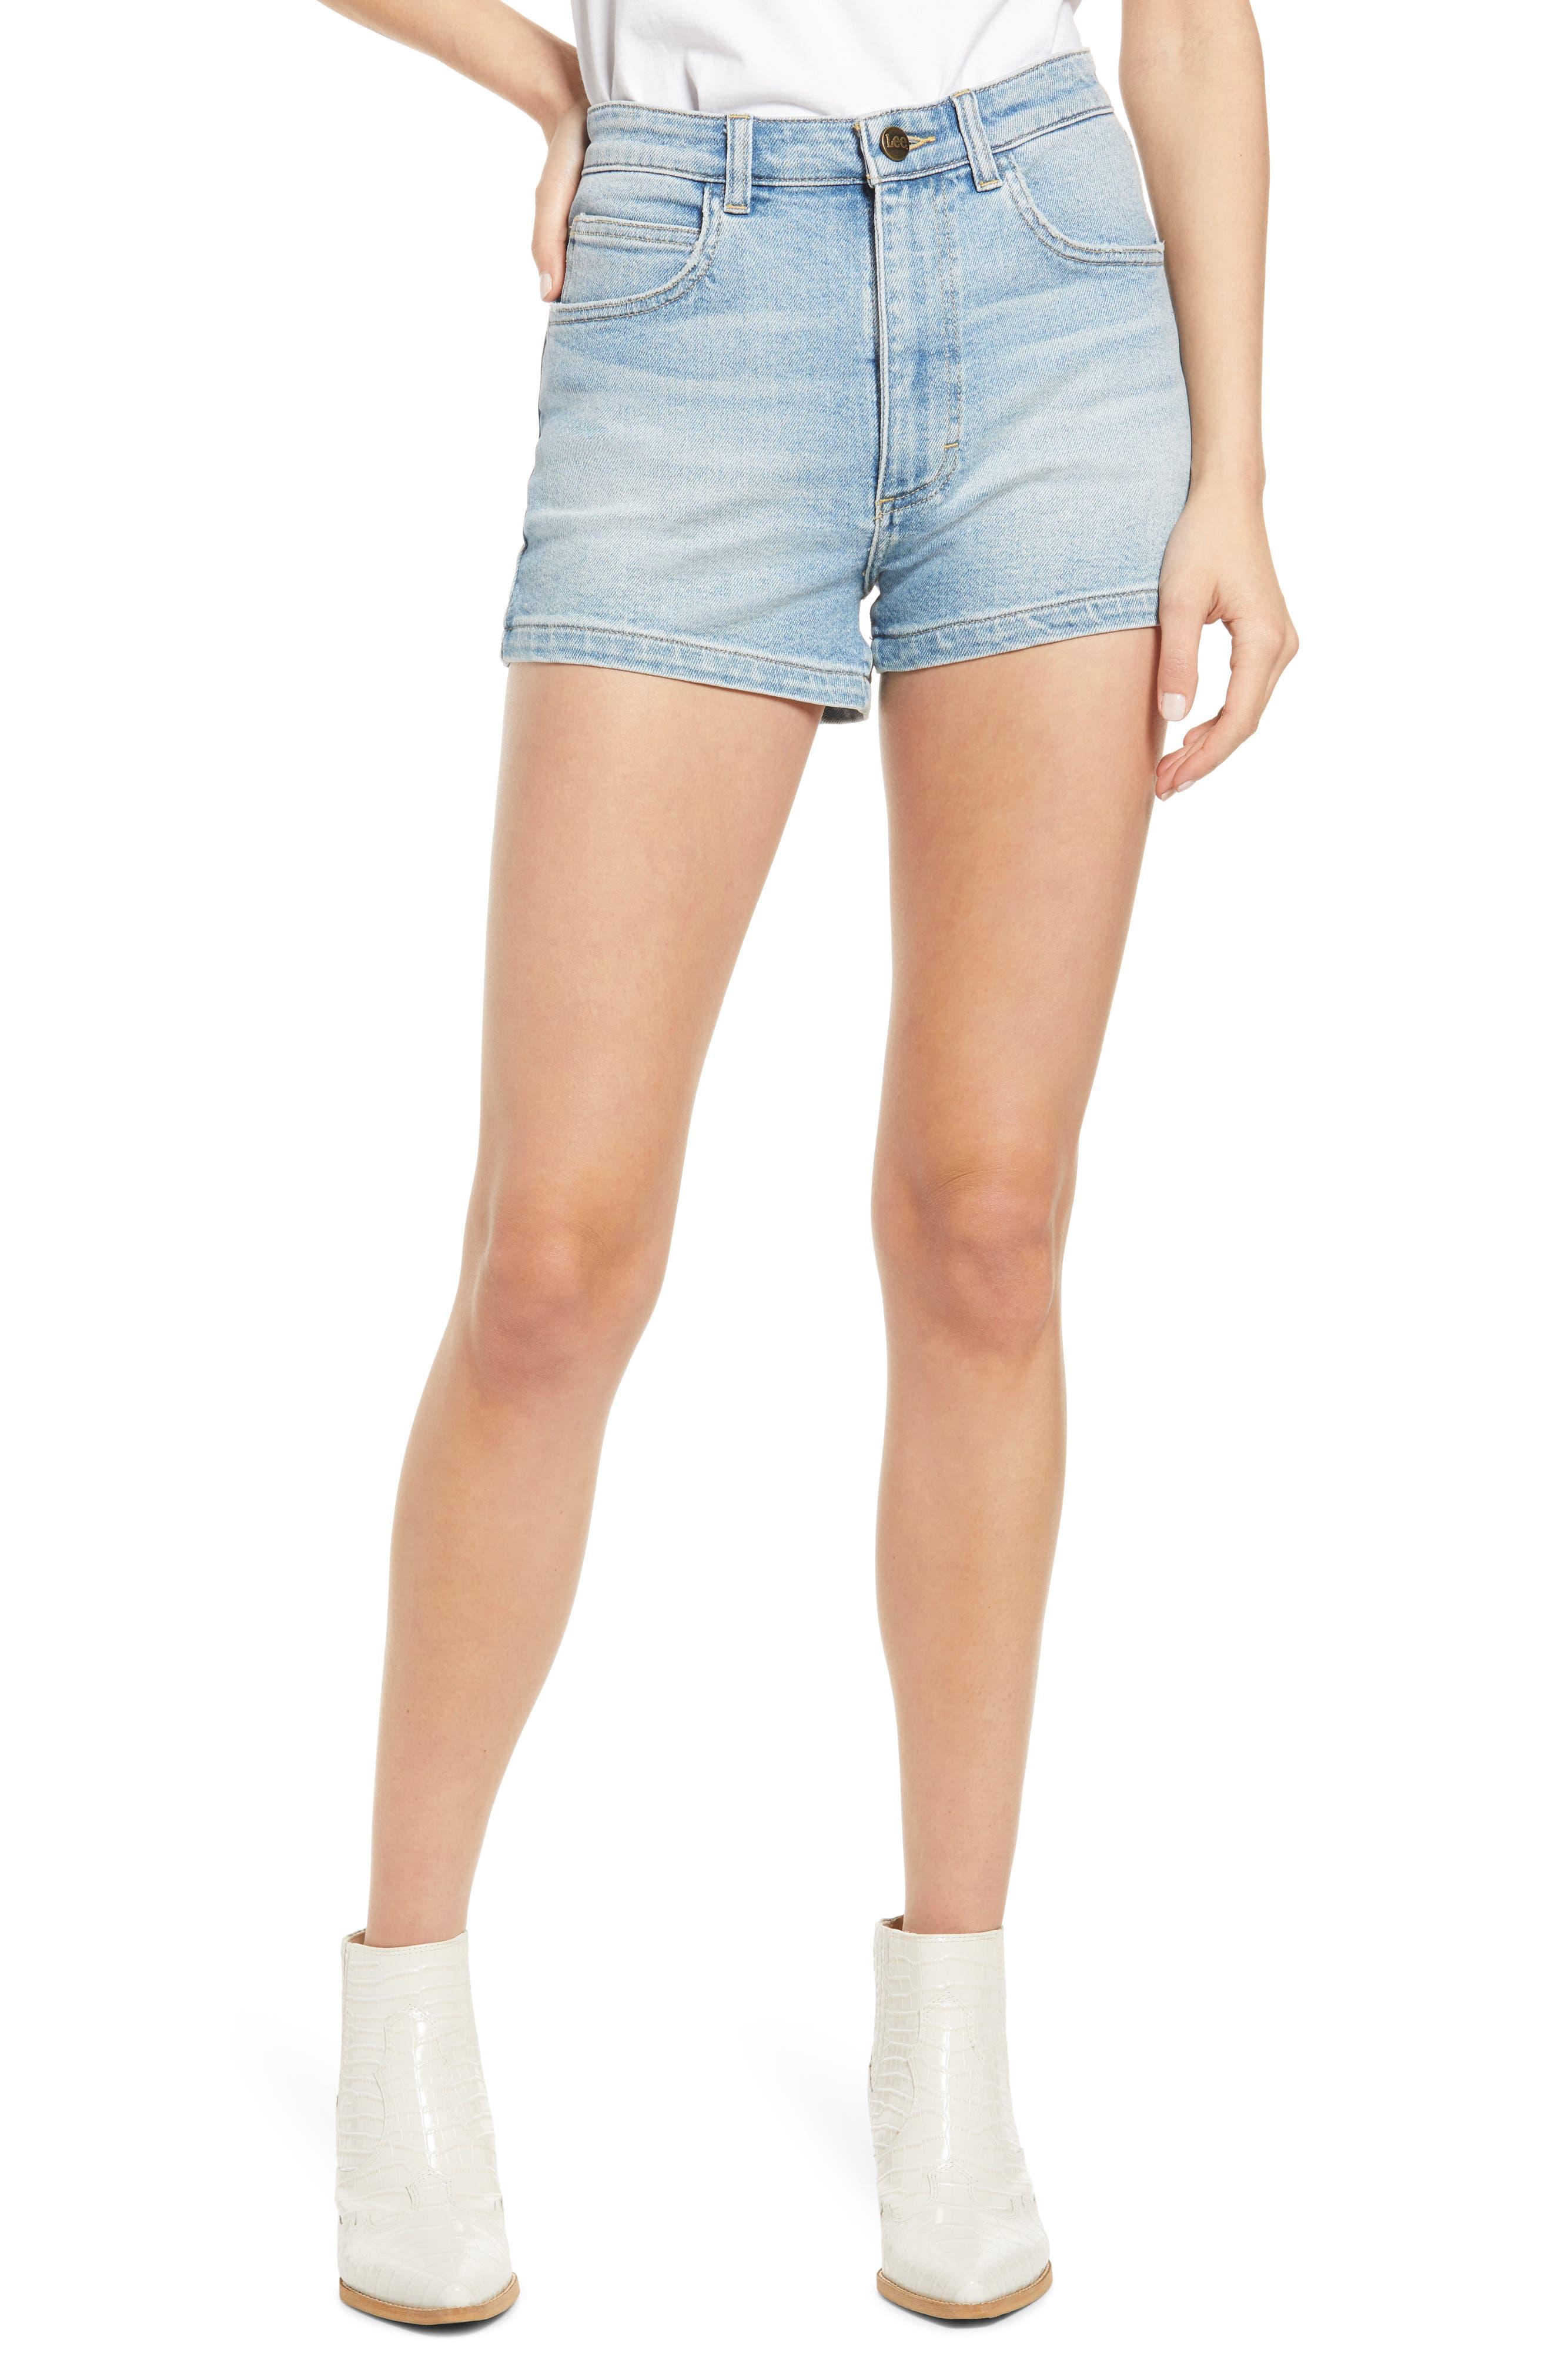 High Waist Pin Up Shorts